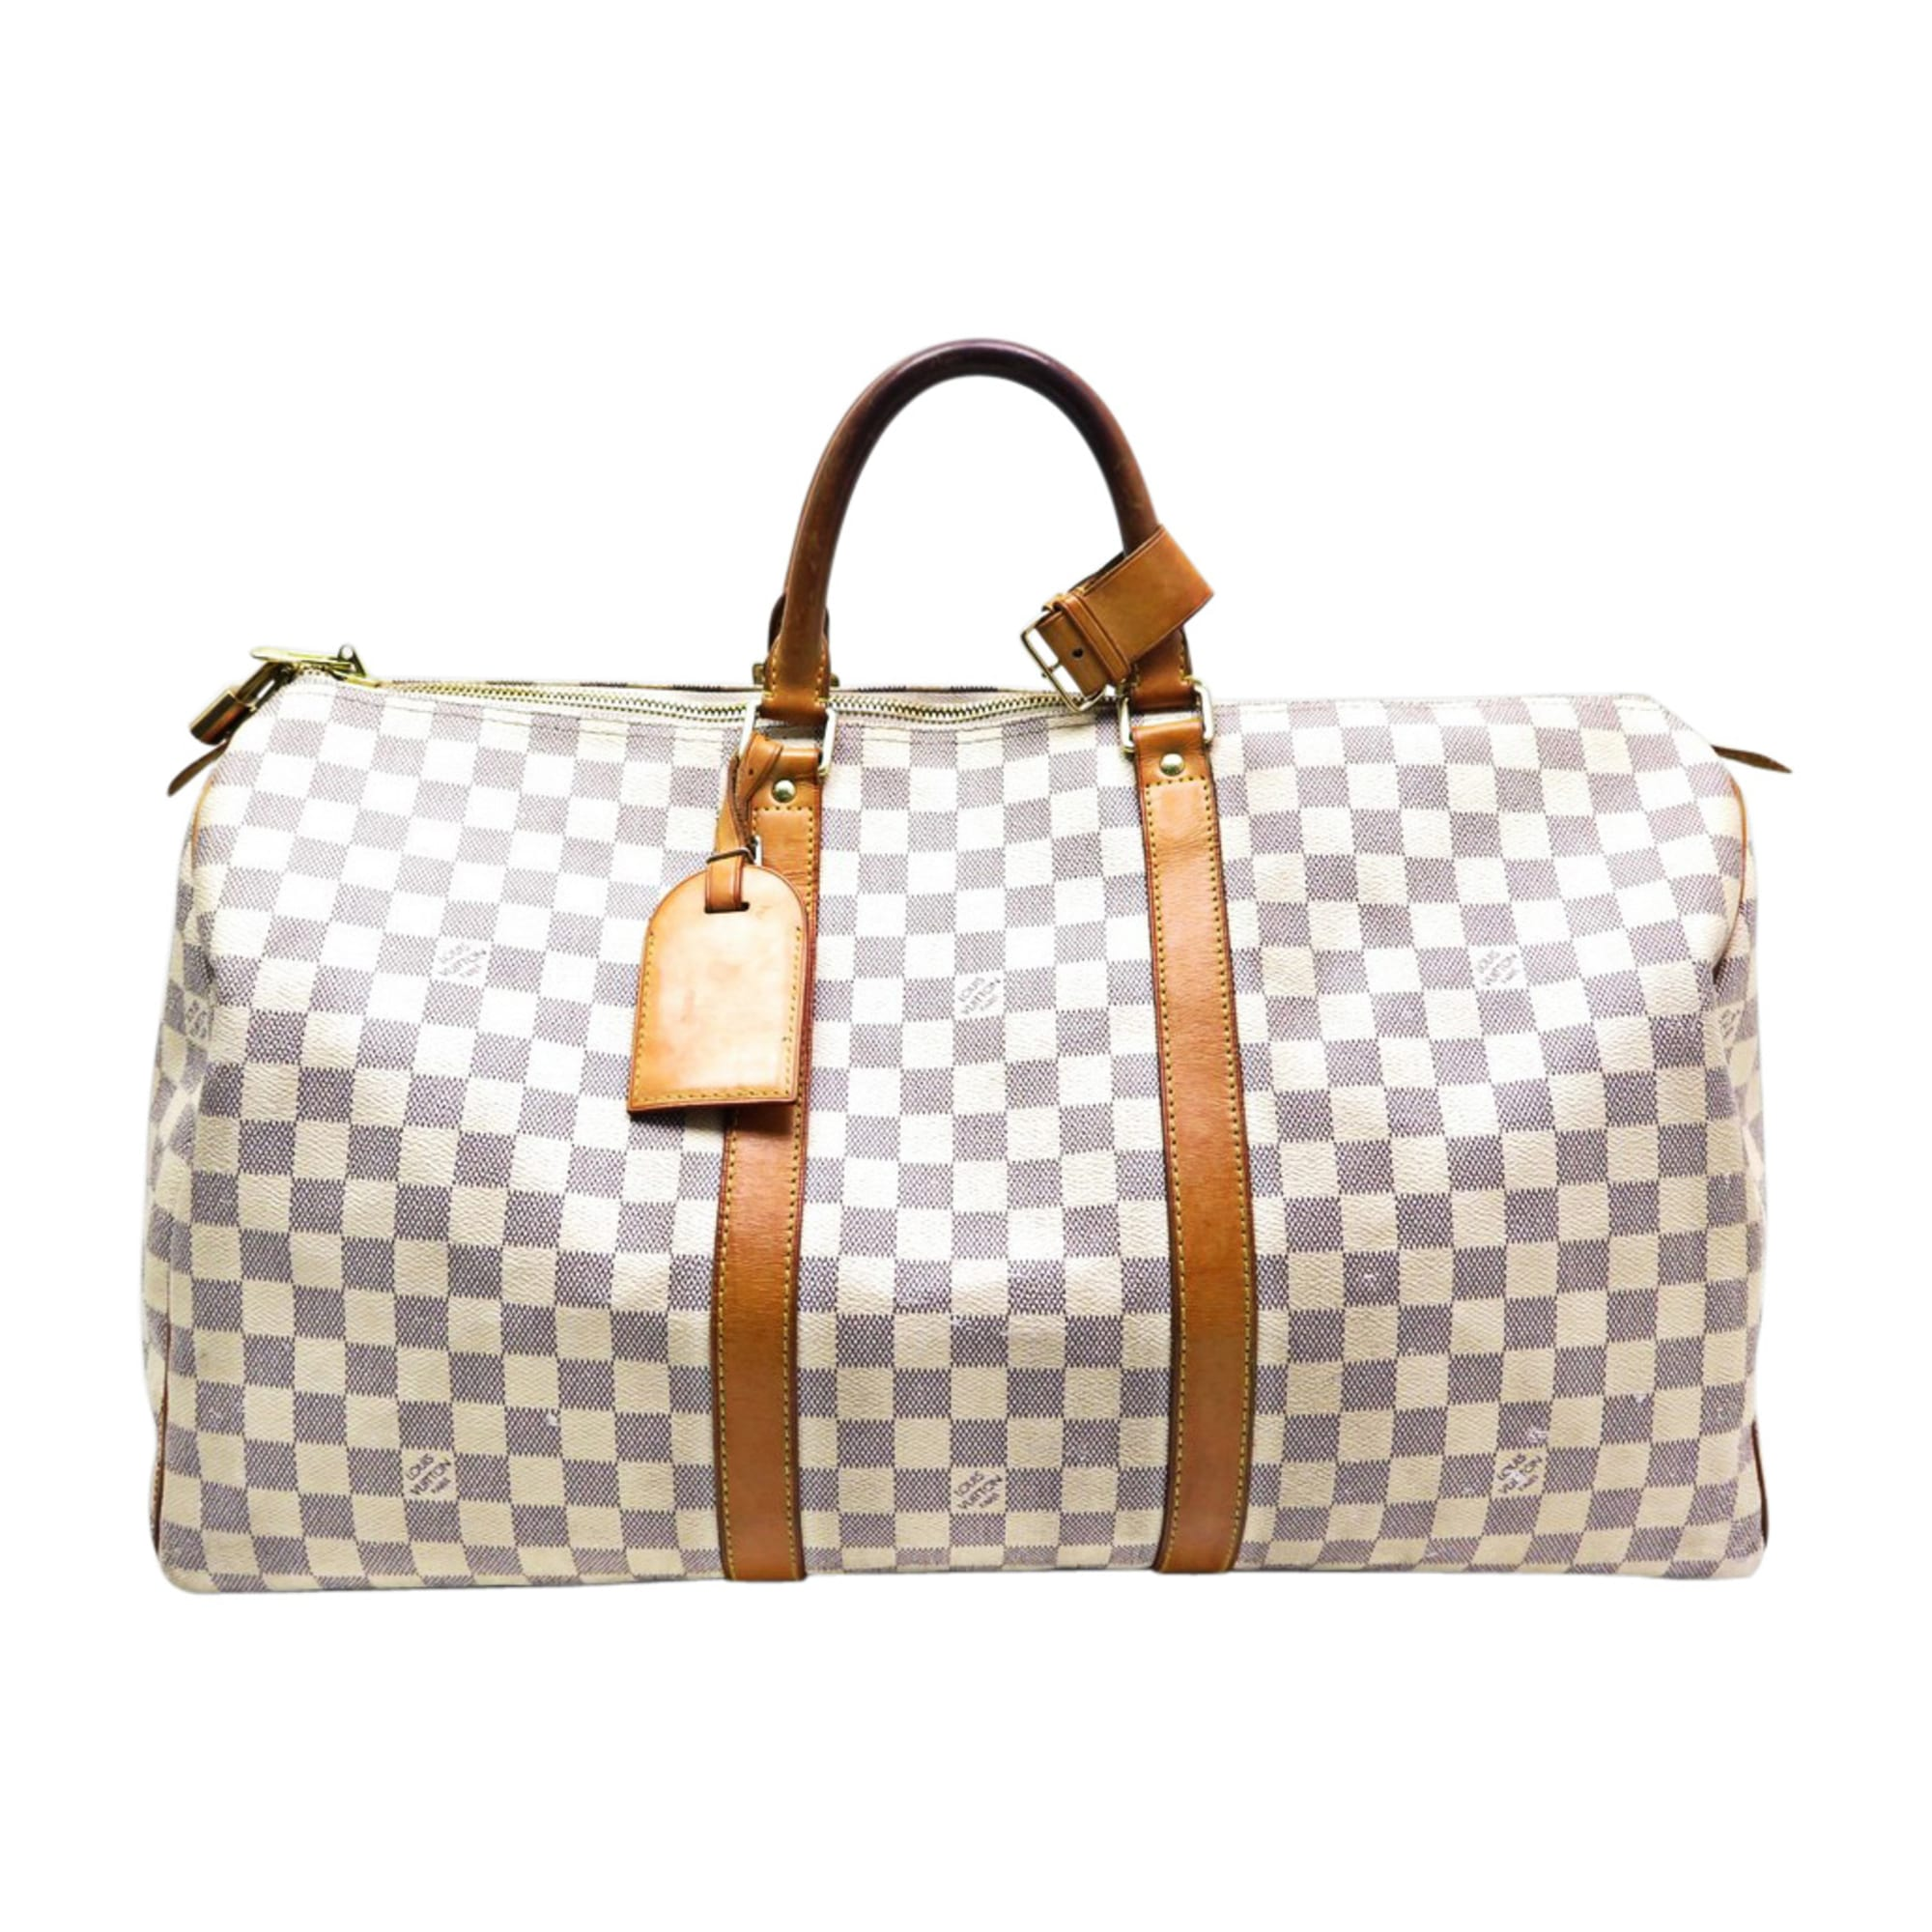 19cd5b042d43 Sac XL en cuir LOUIS VUITTON Keepall Blanc, blanc cassé, écru